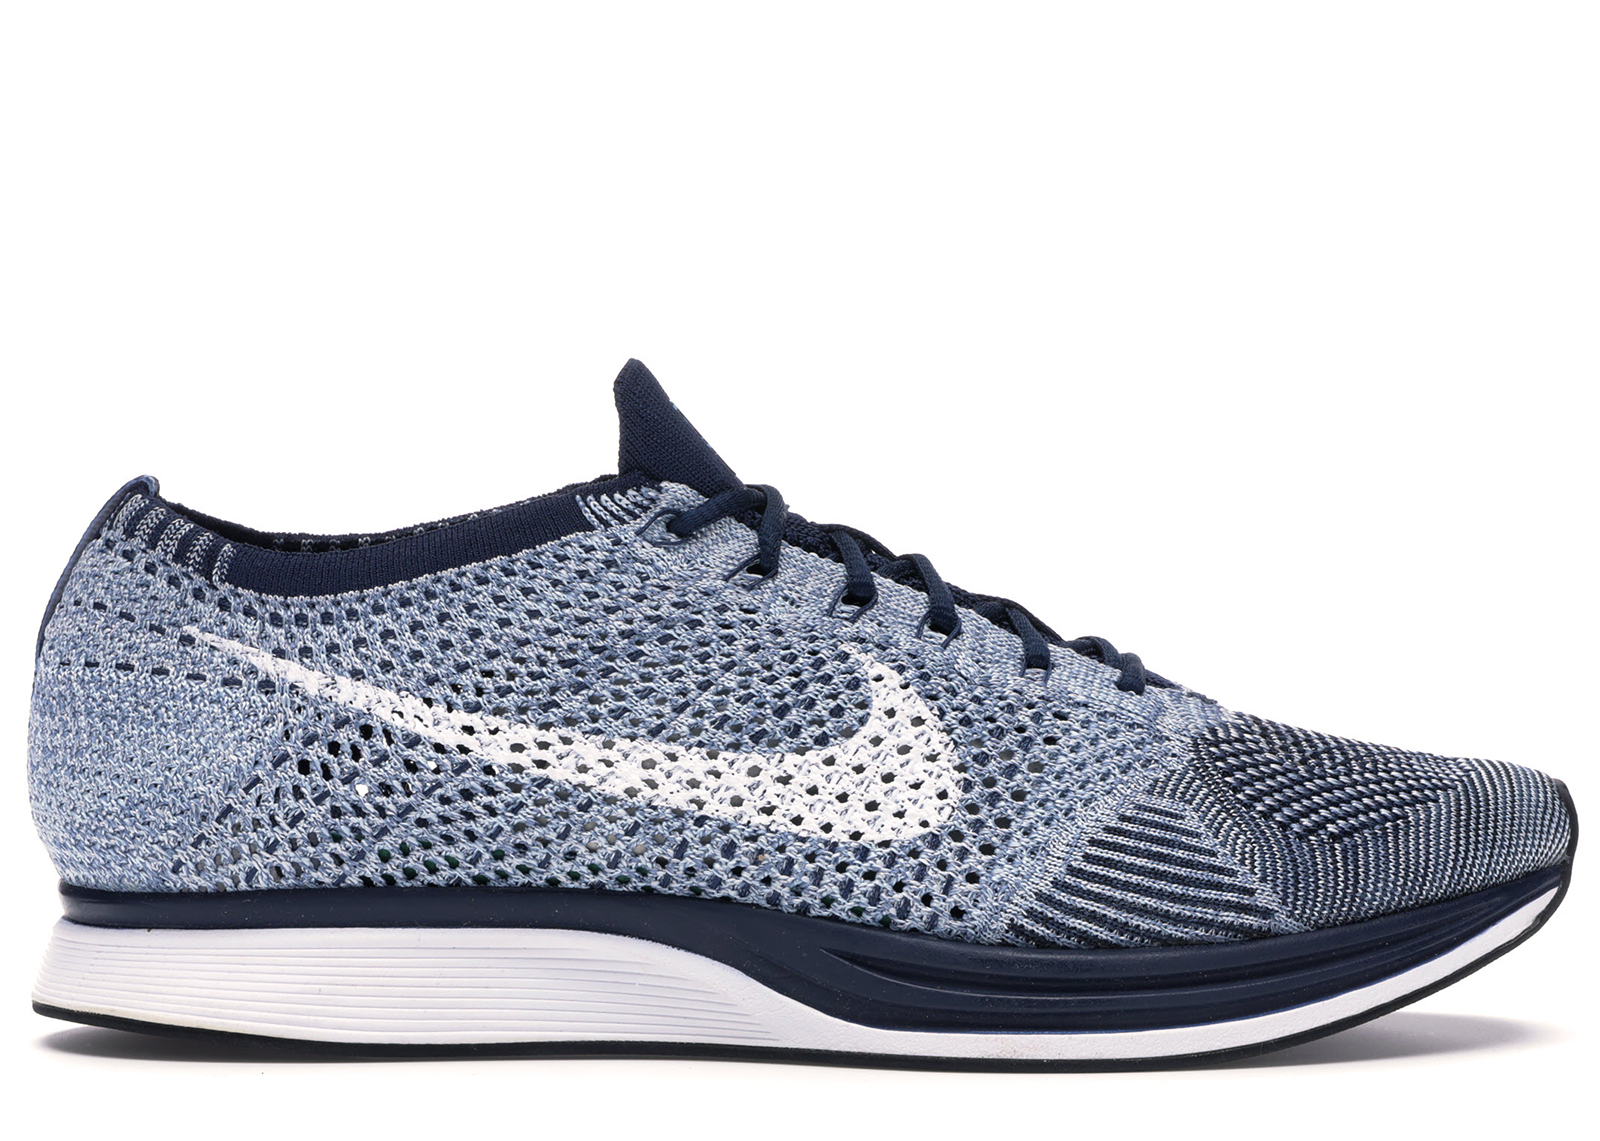 Nike Flyknit Racer Blue Tint - 862713-401